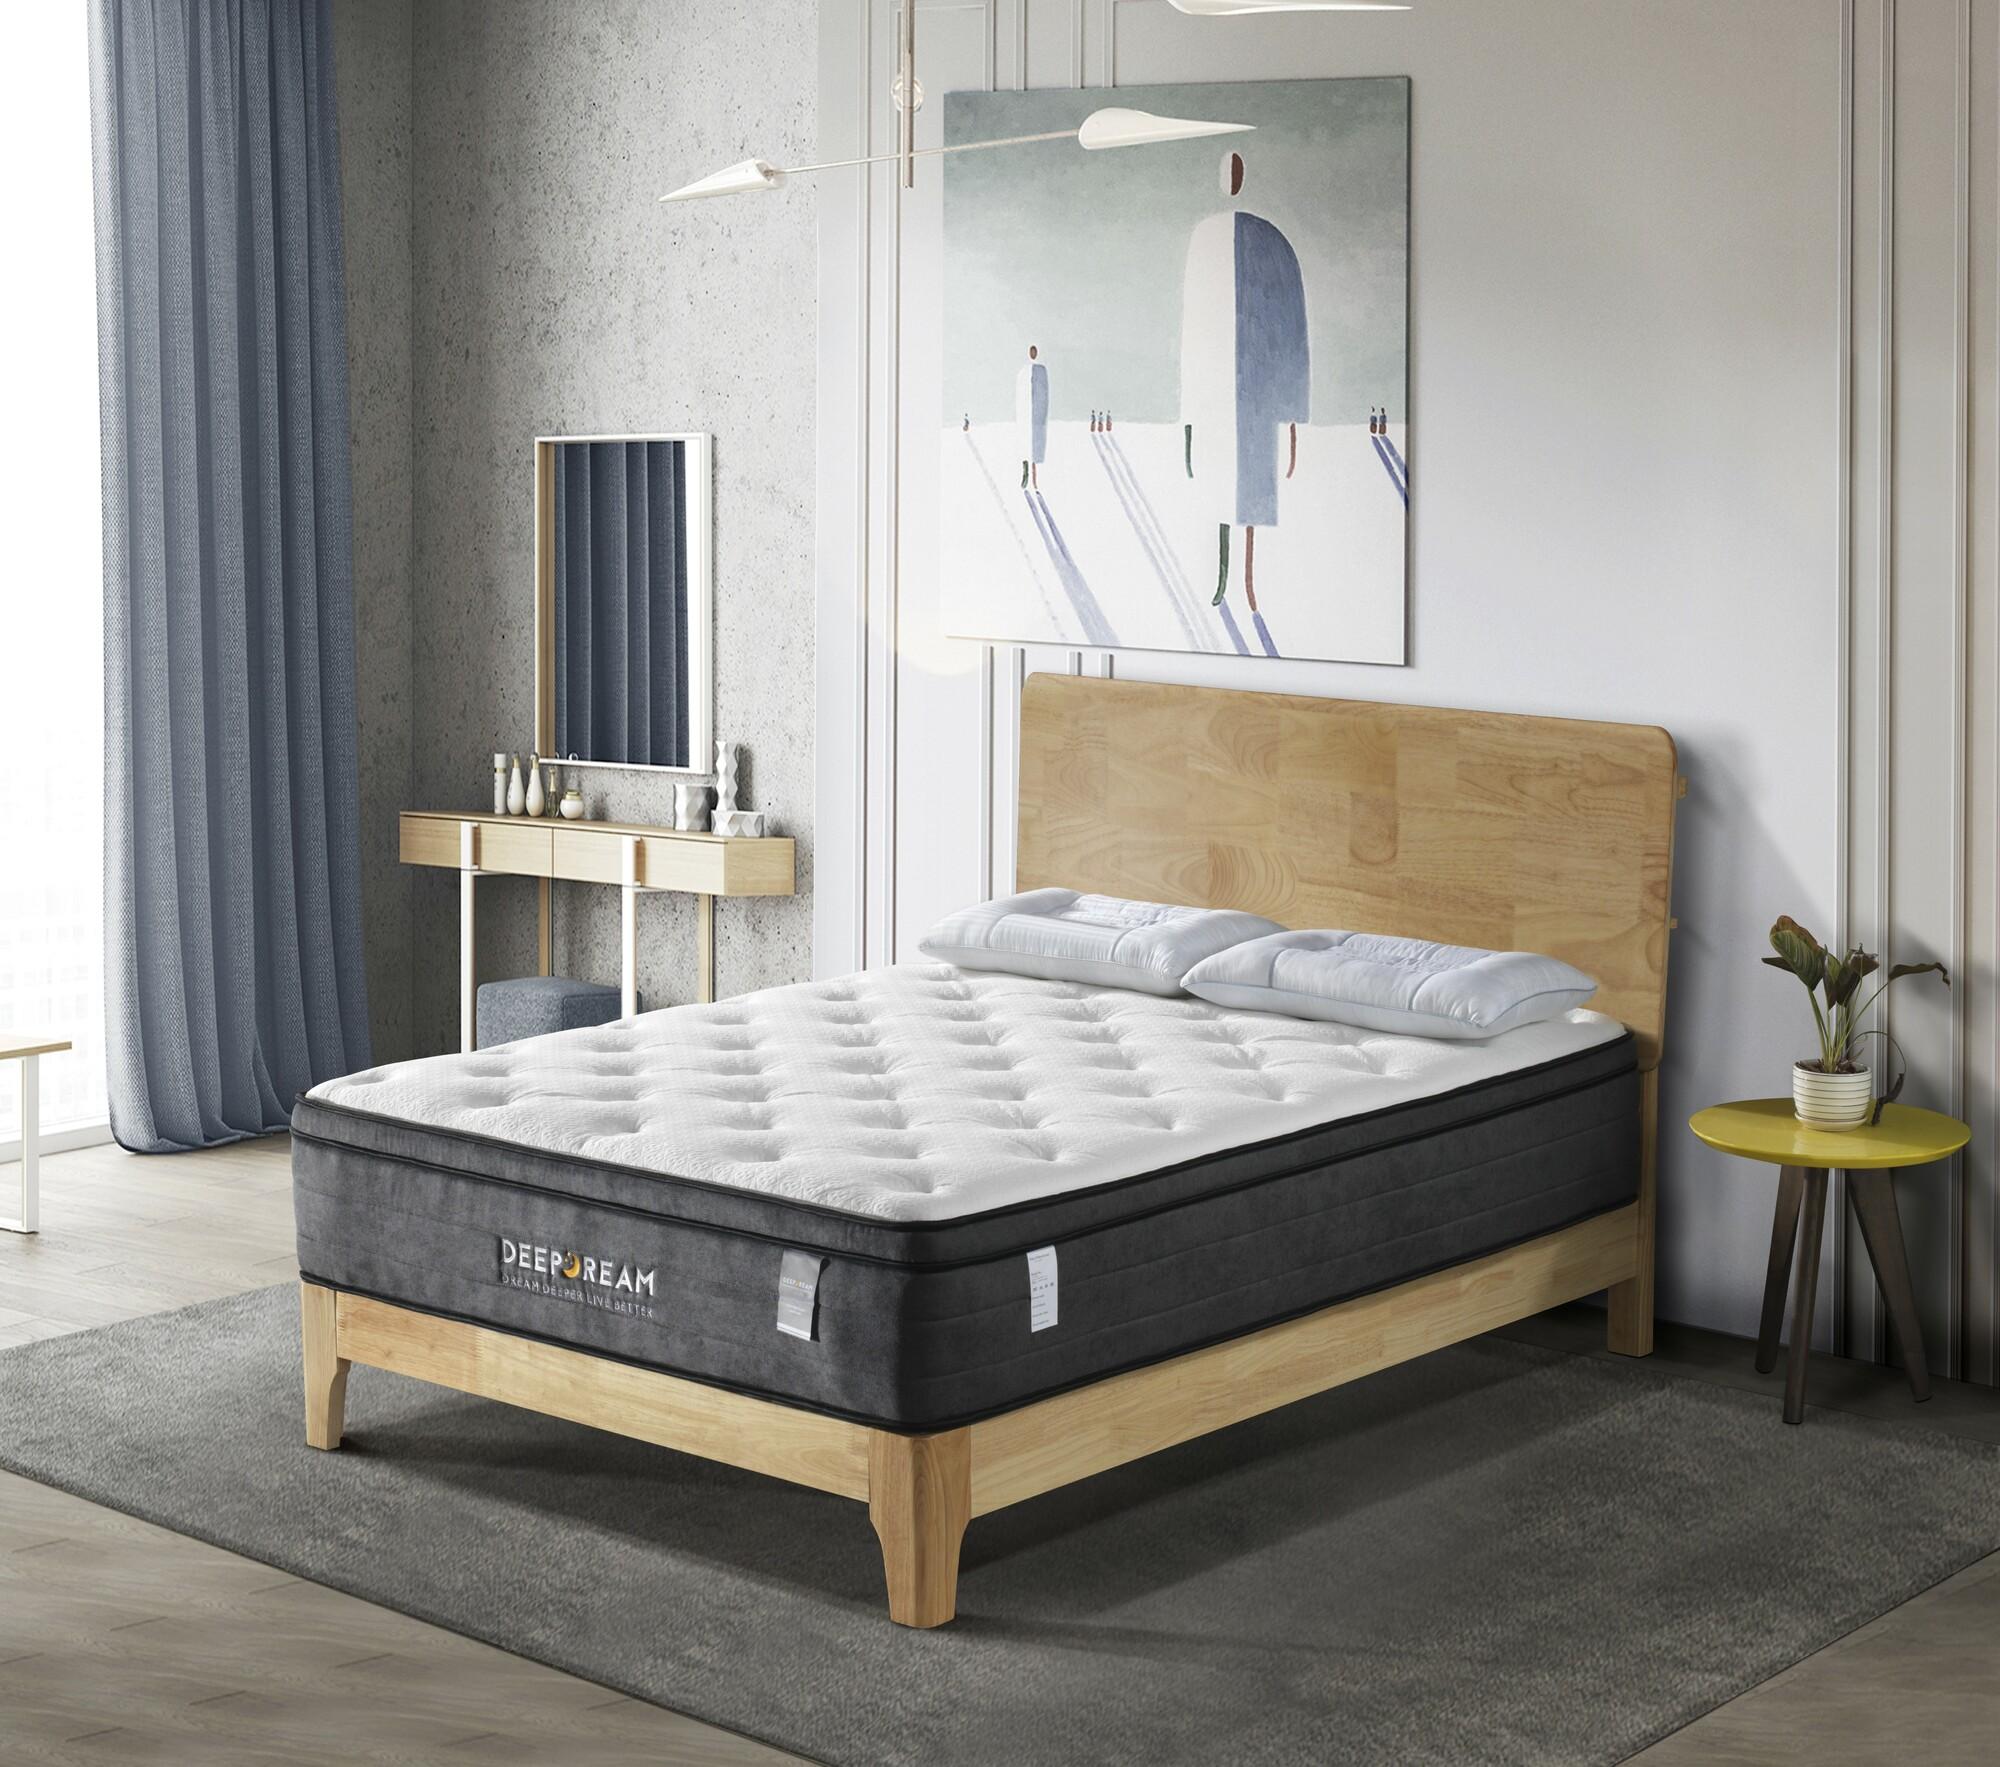 NEW-Essential-5-Zone-Foam-Mattress-NordicHouse-Bed-Mattresses thumbnail 11